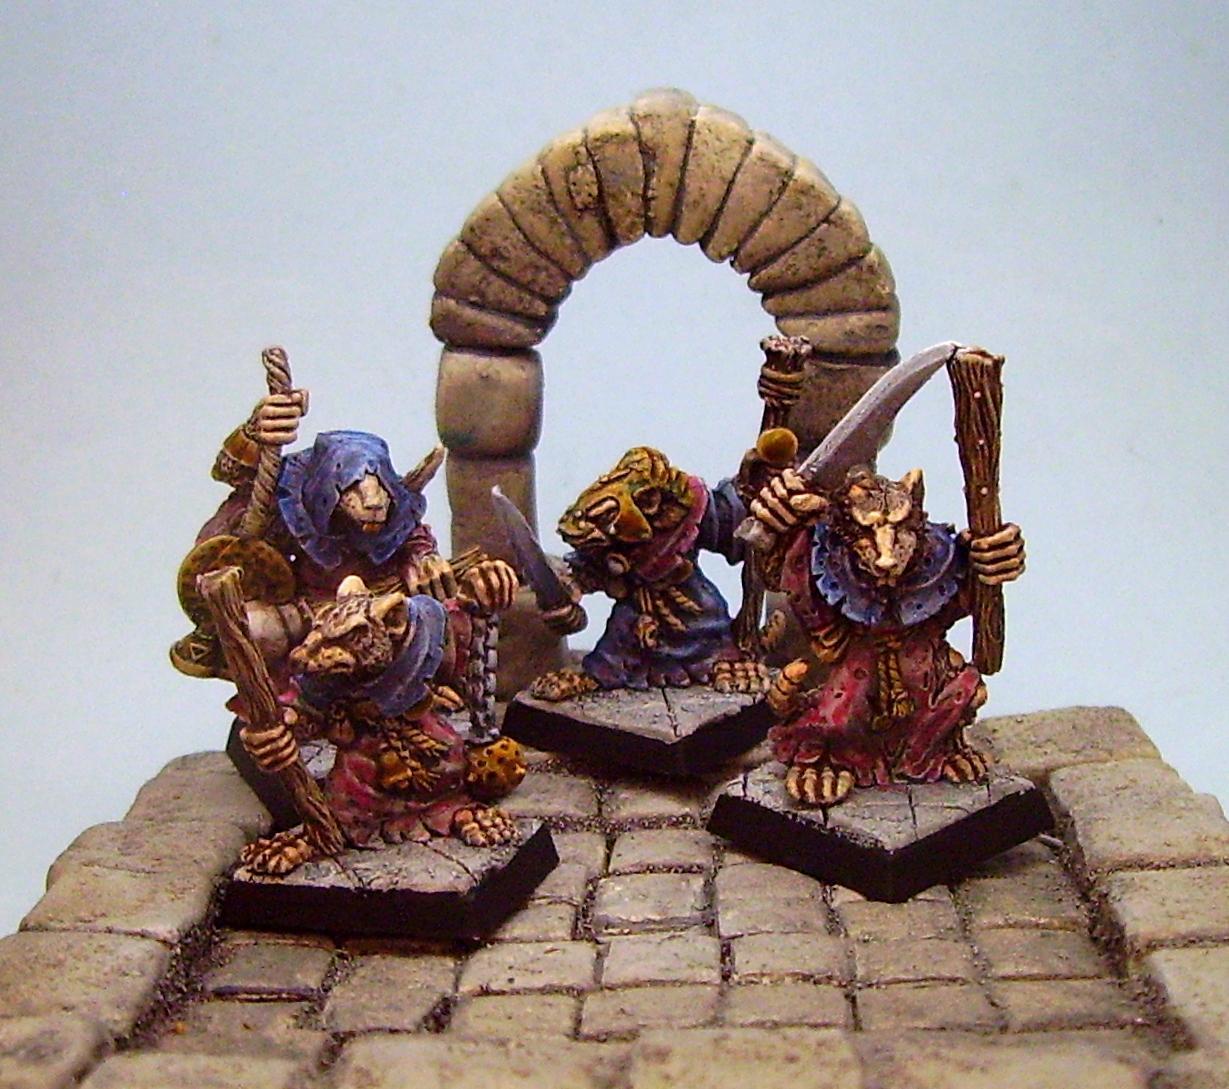 Skaven, Warhammer Fantasy, Warhammer Fantasy Battles